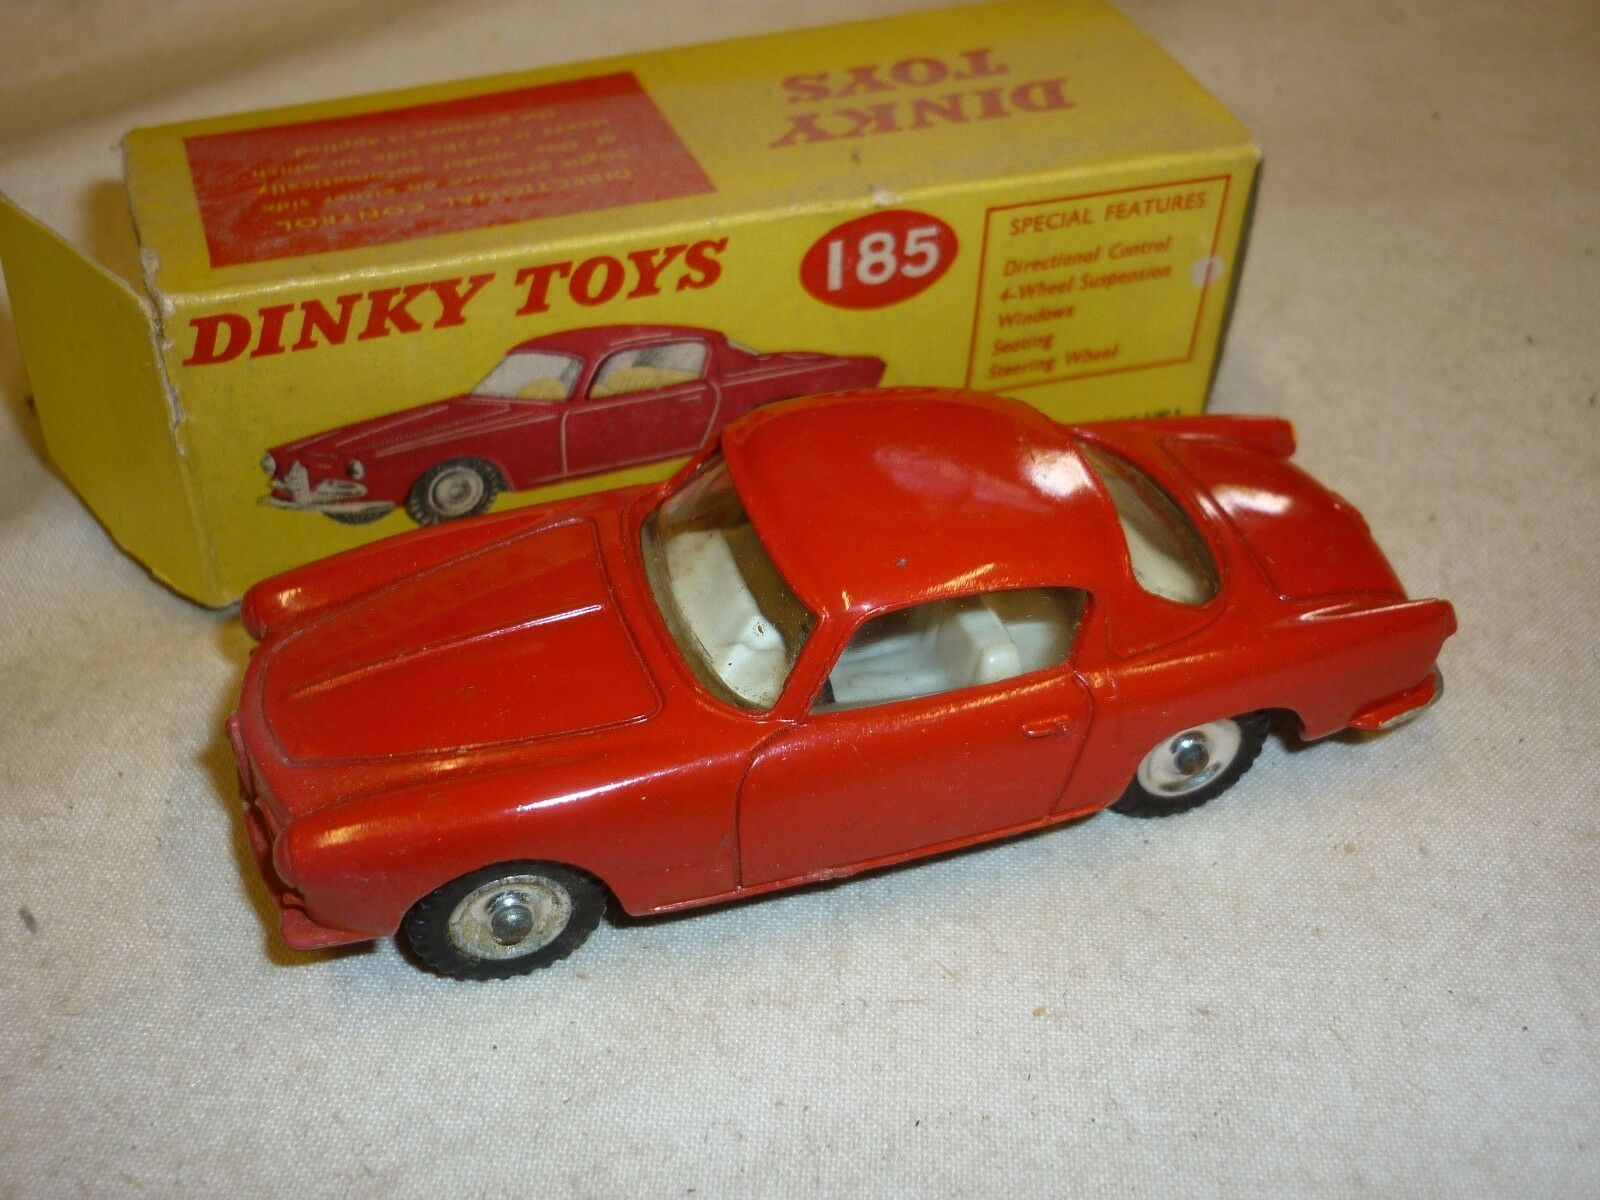 DINKY TOYS 185, ALFA ROMEO 1900 SUPER SPRINT, boxed.